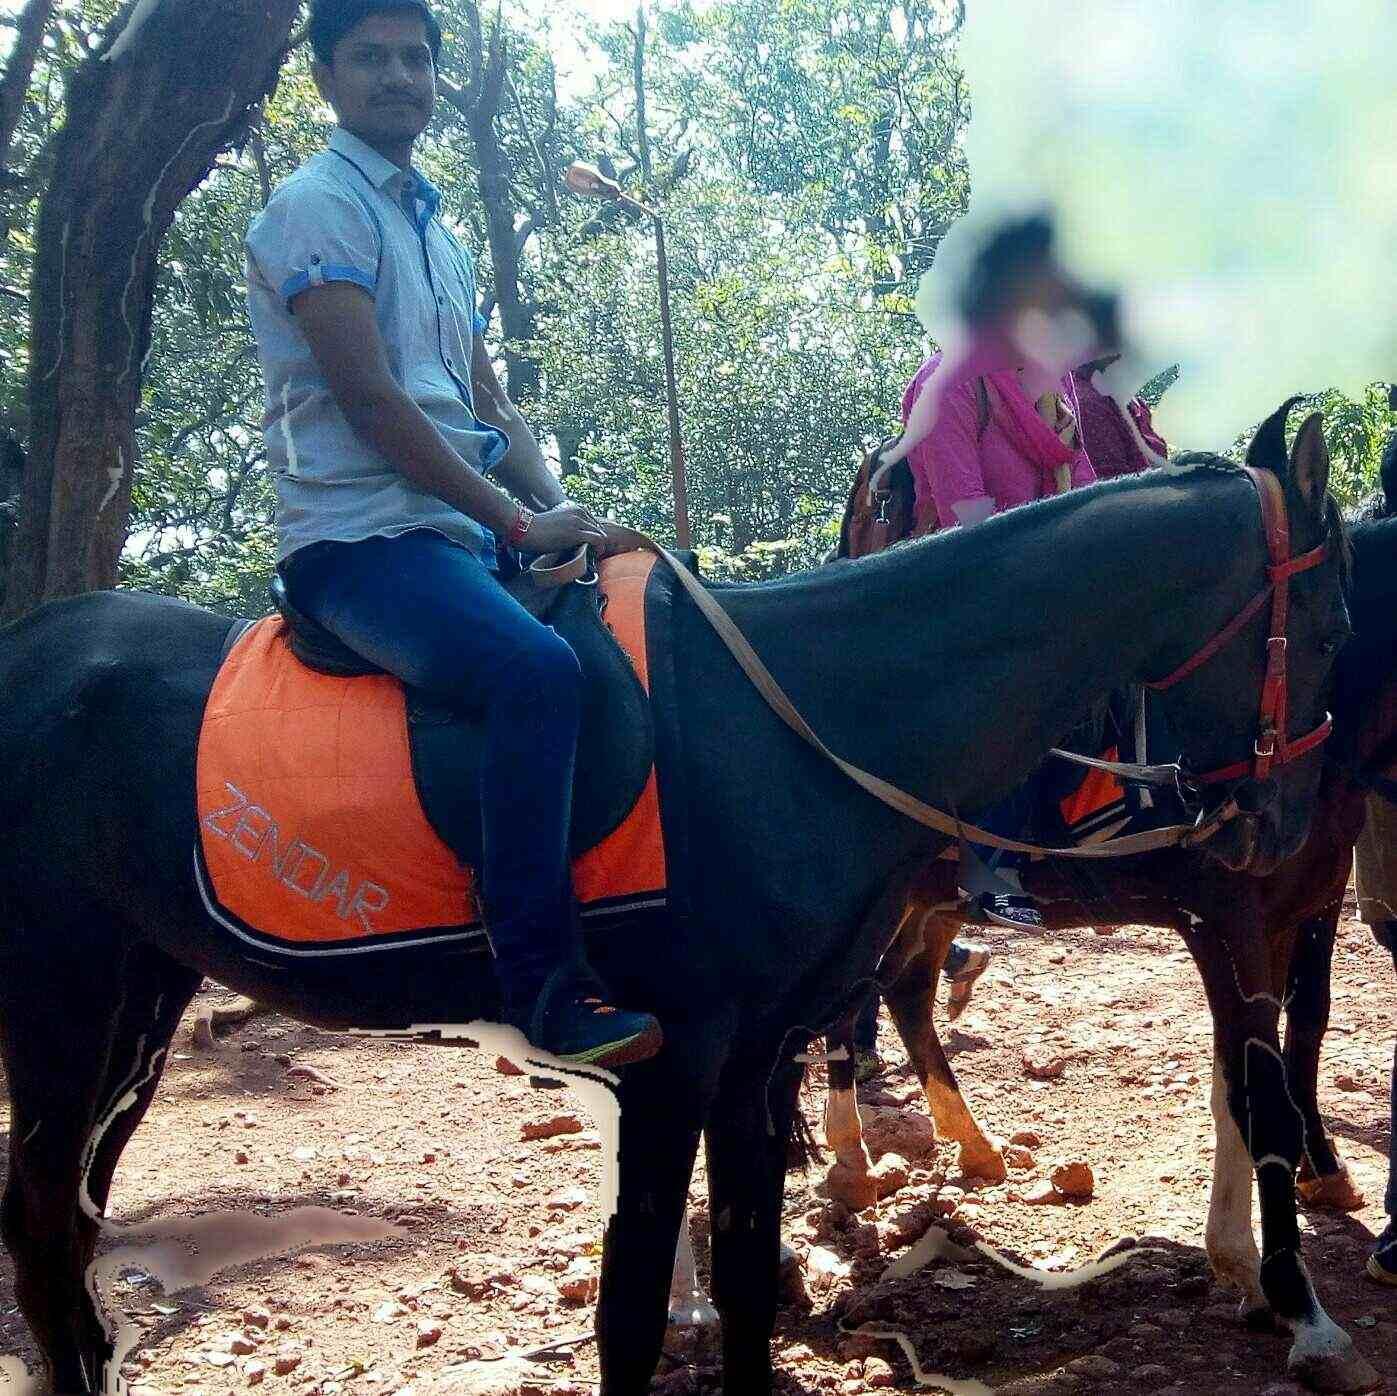 Vatsal Singh (Suryavanshi #Rajput) Cricketer Vatsal Singh (under 17 state level)